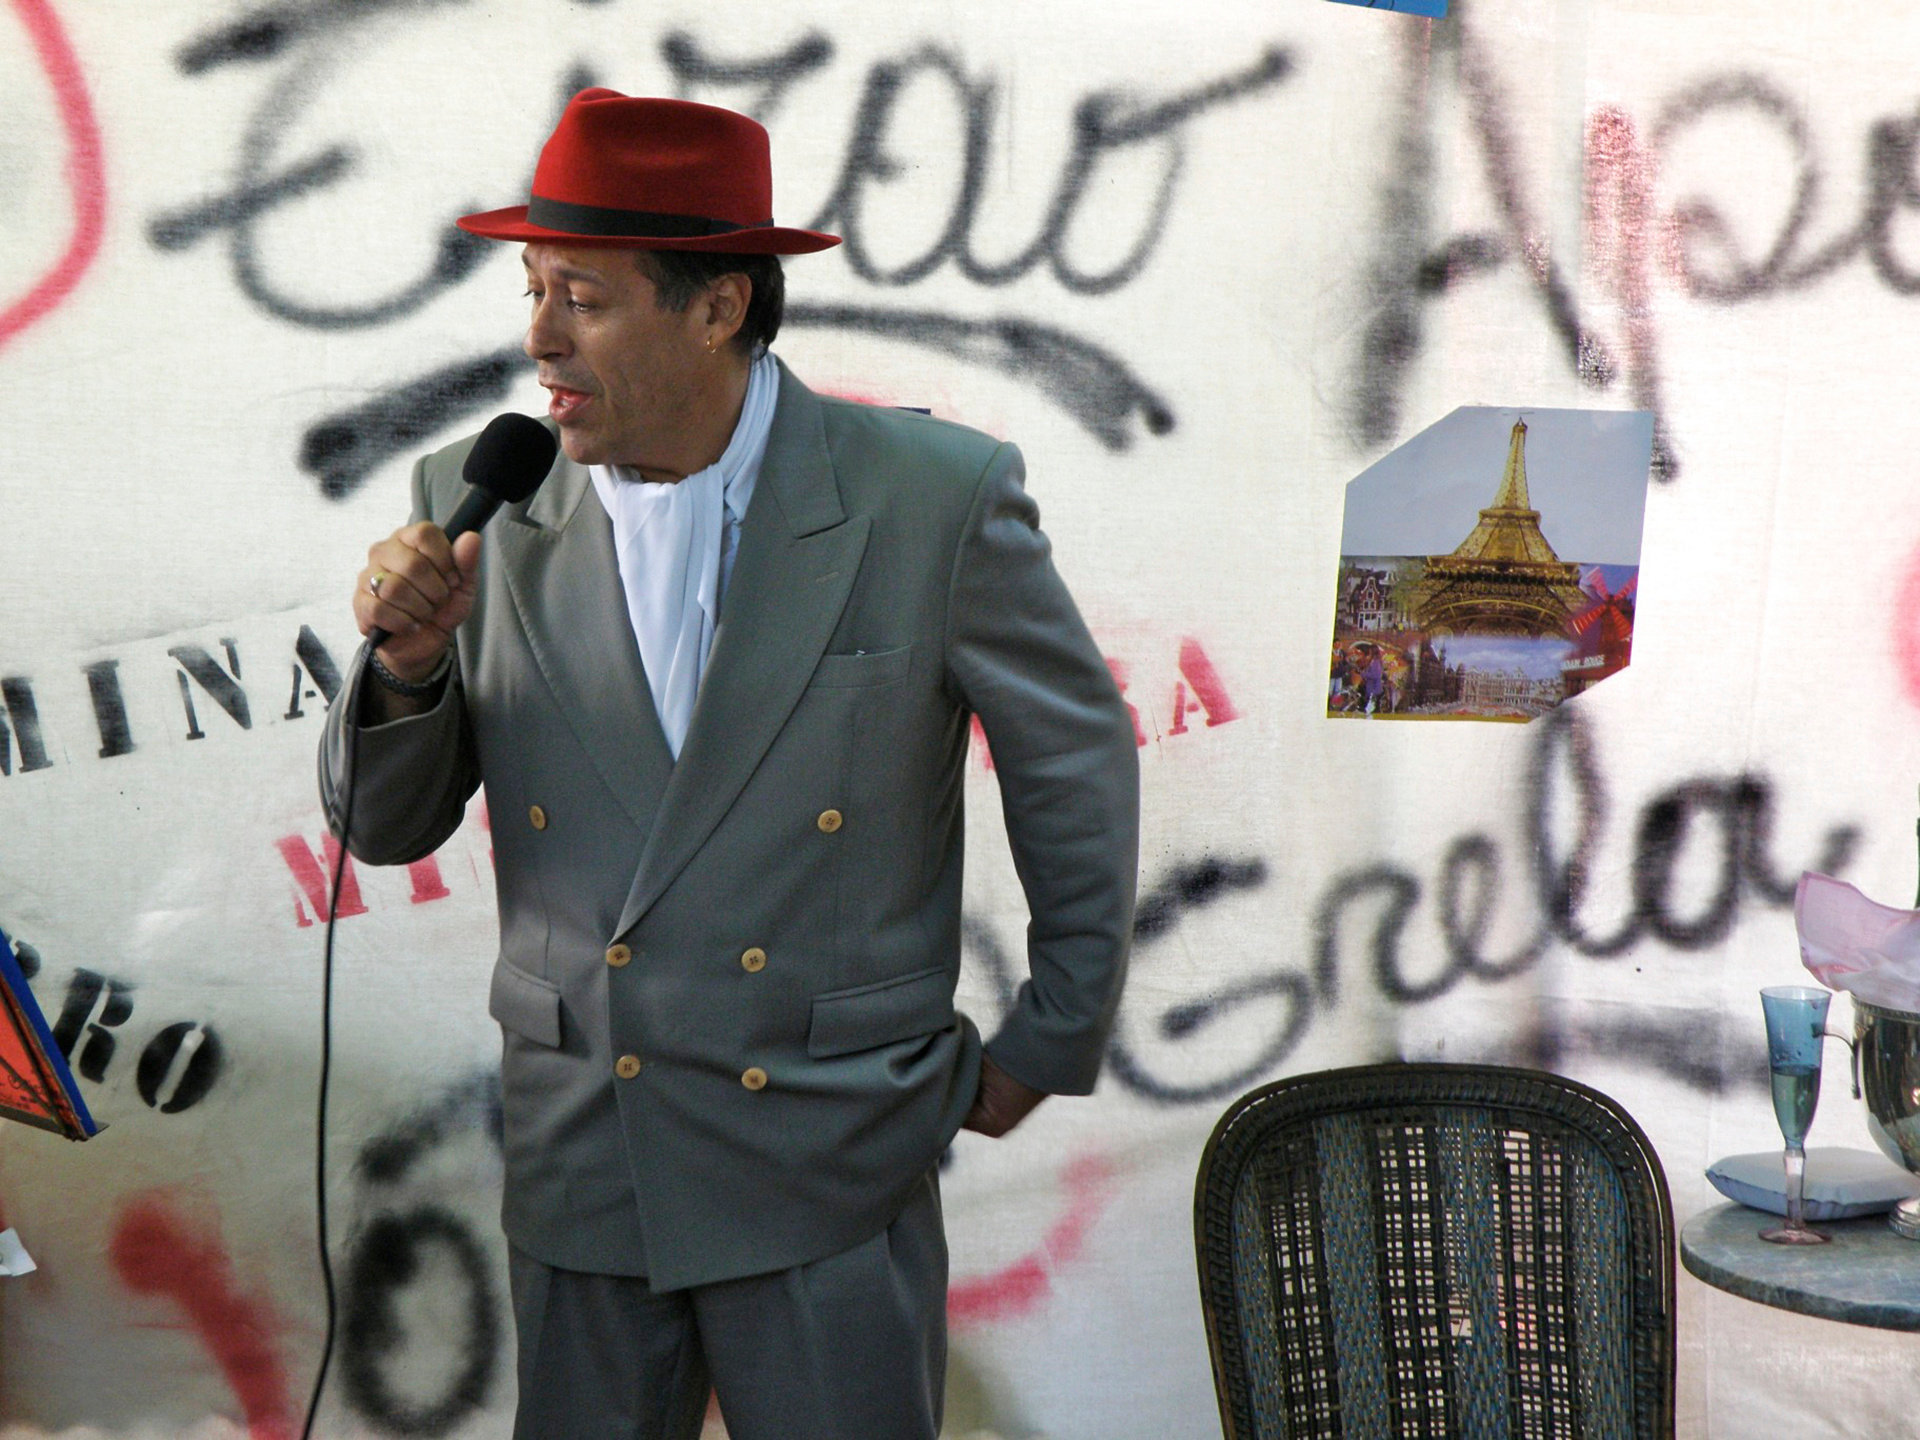 Singer in San Telmo